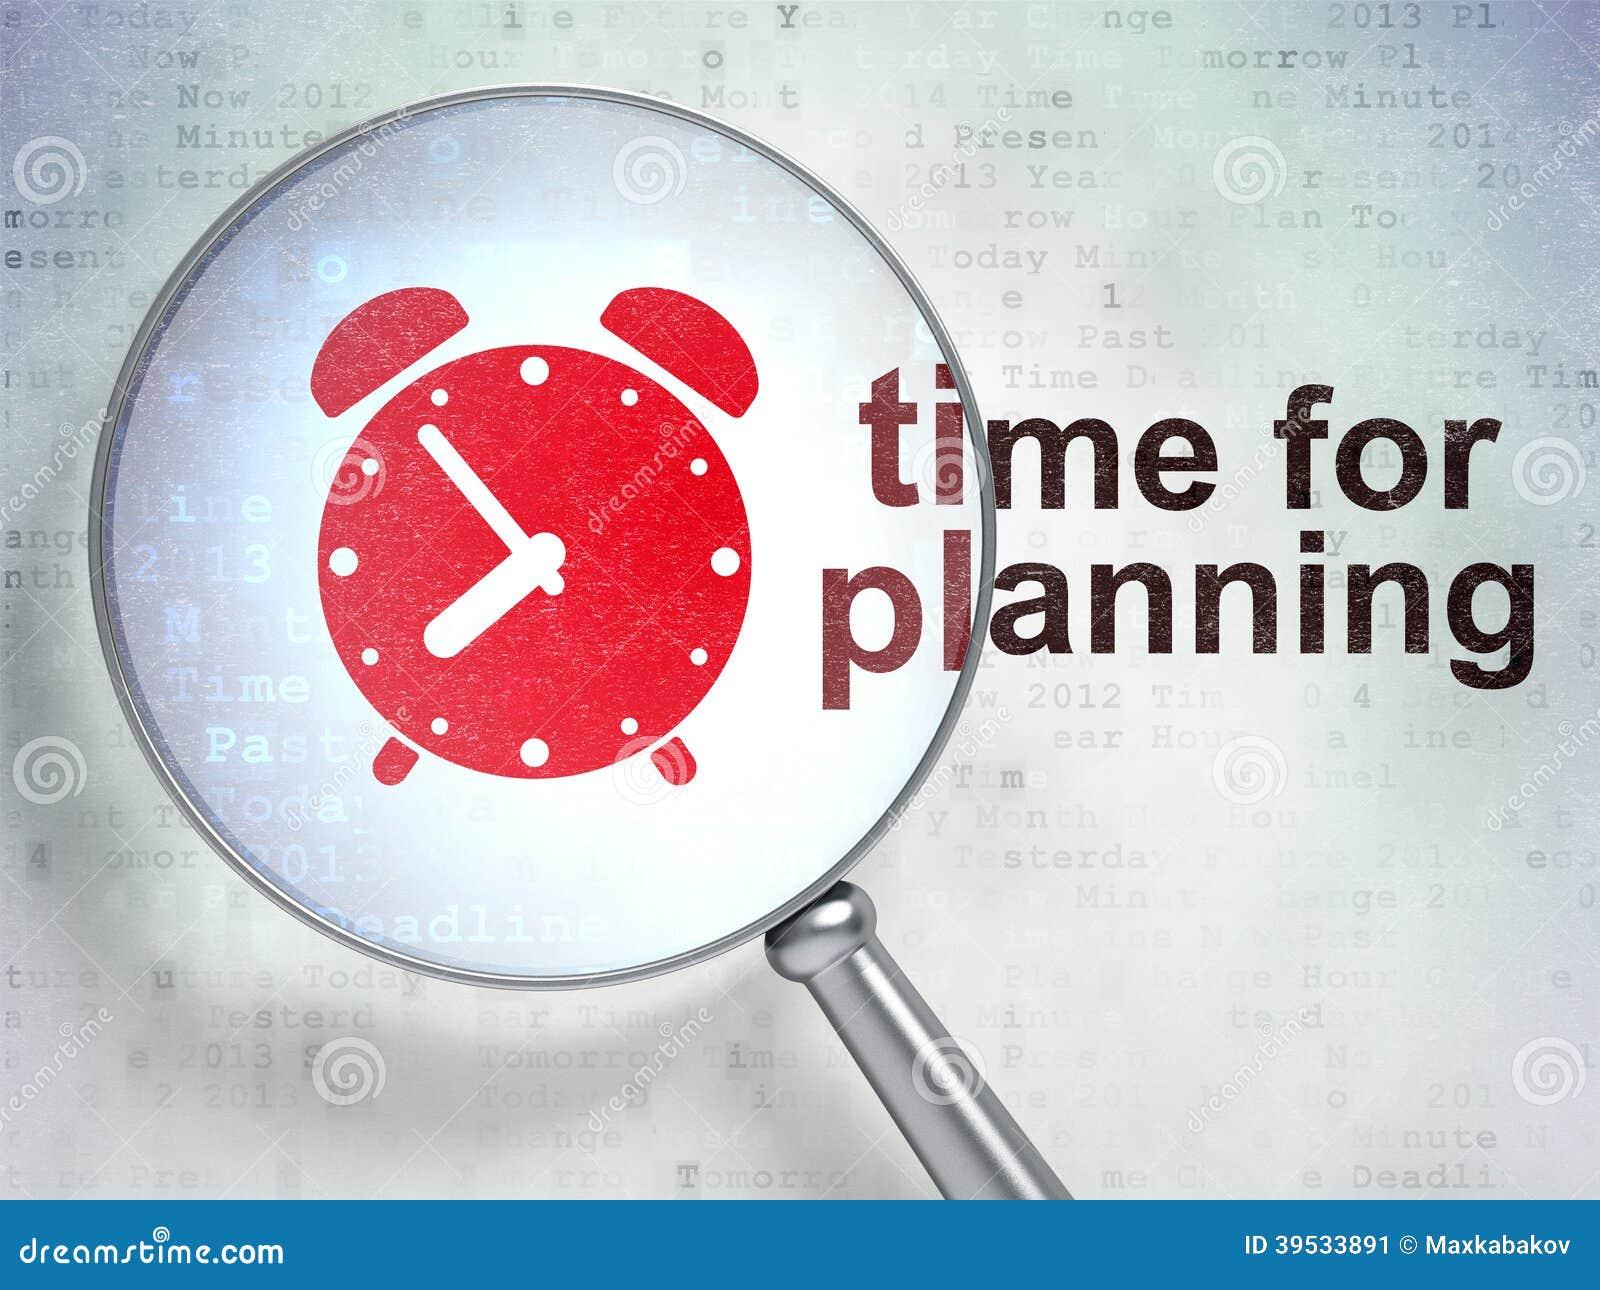 Time Planning Stock Illustration - Image: 59357489